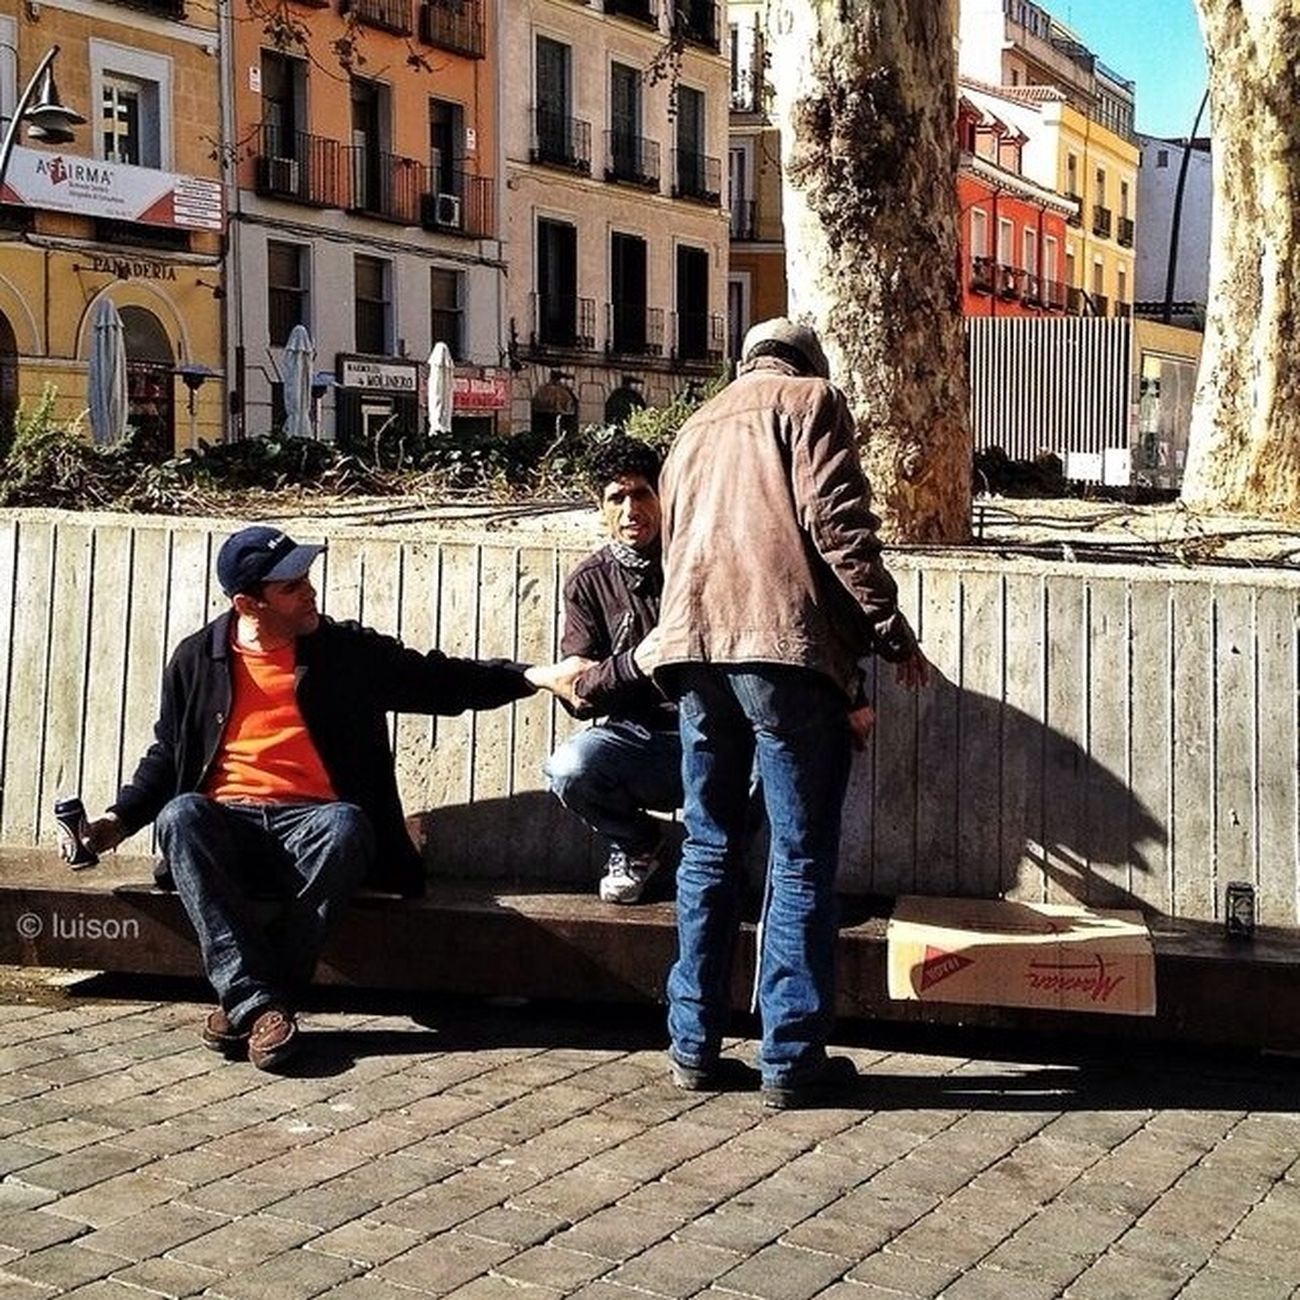 streetphotography at Plaza Tirso de Molina Streetphotography